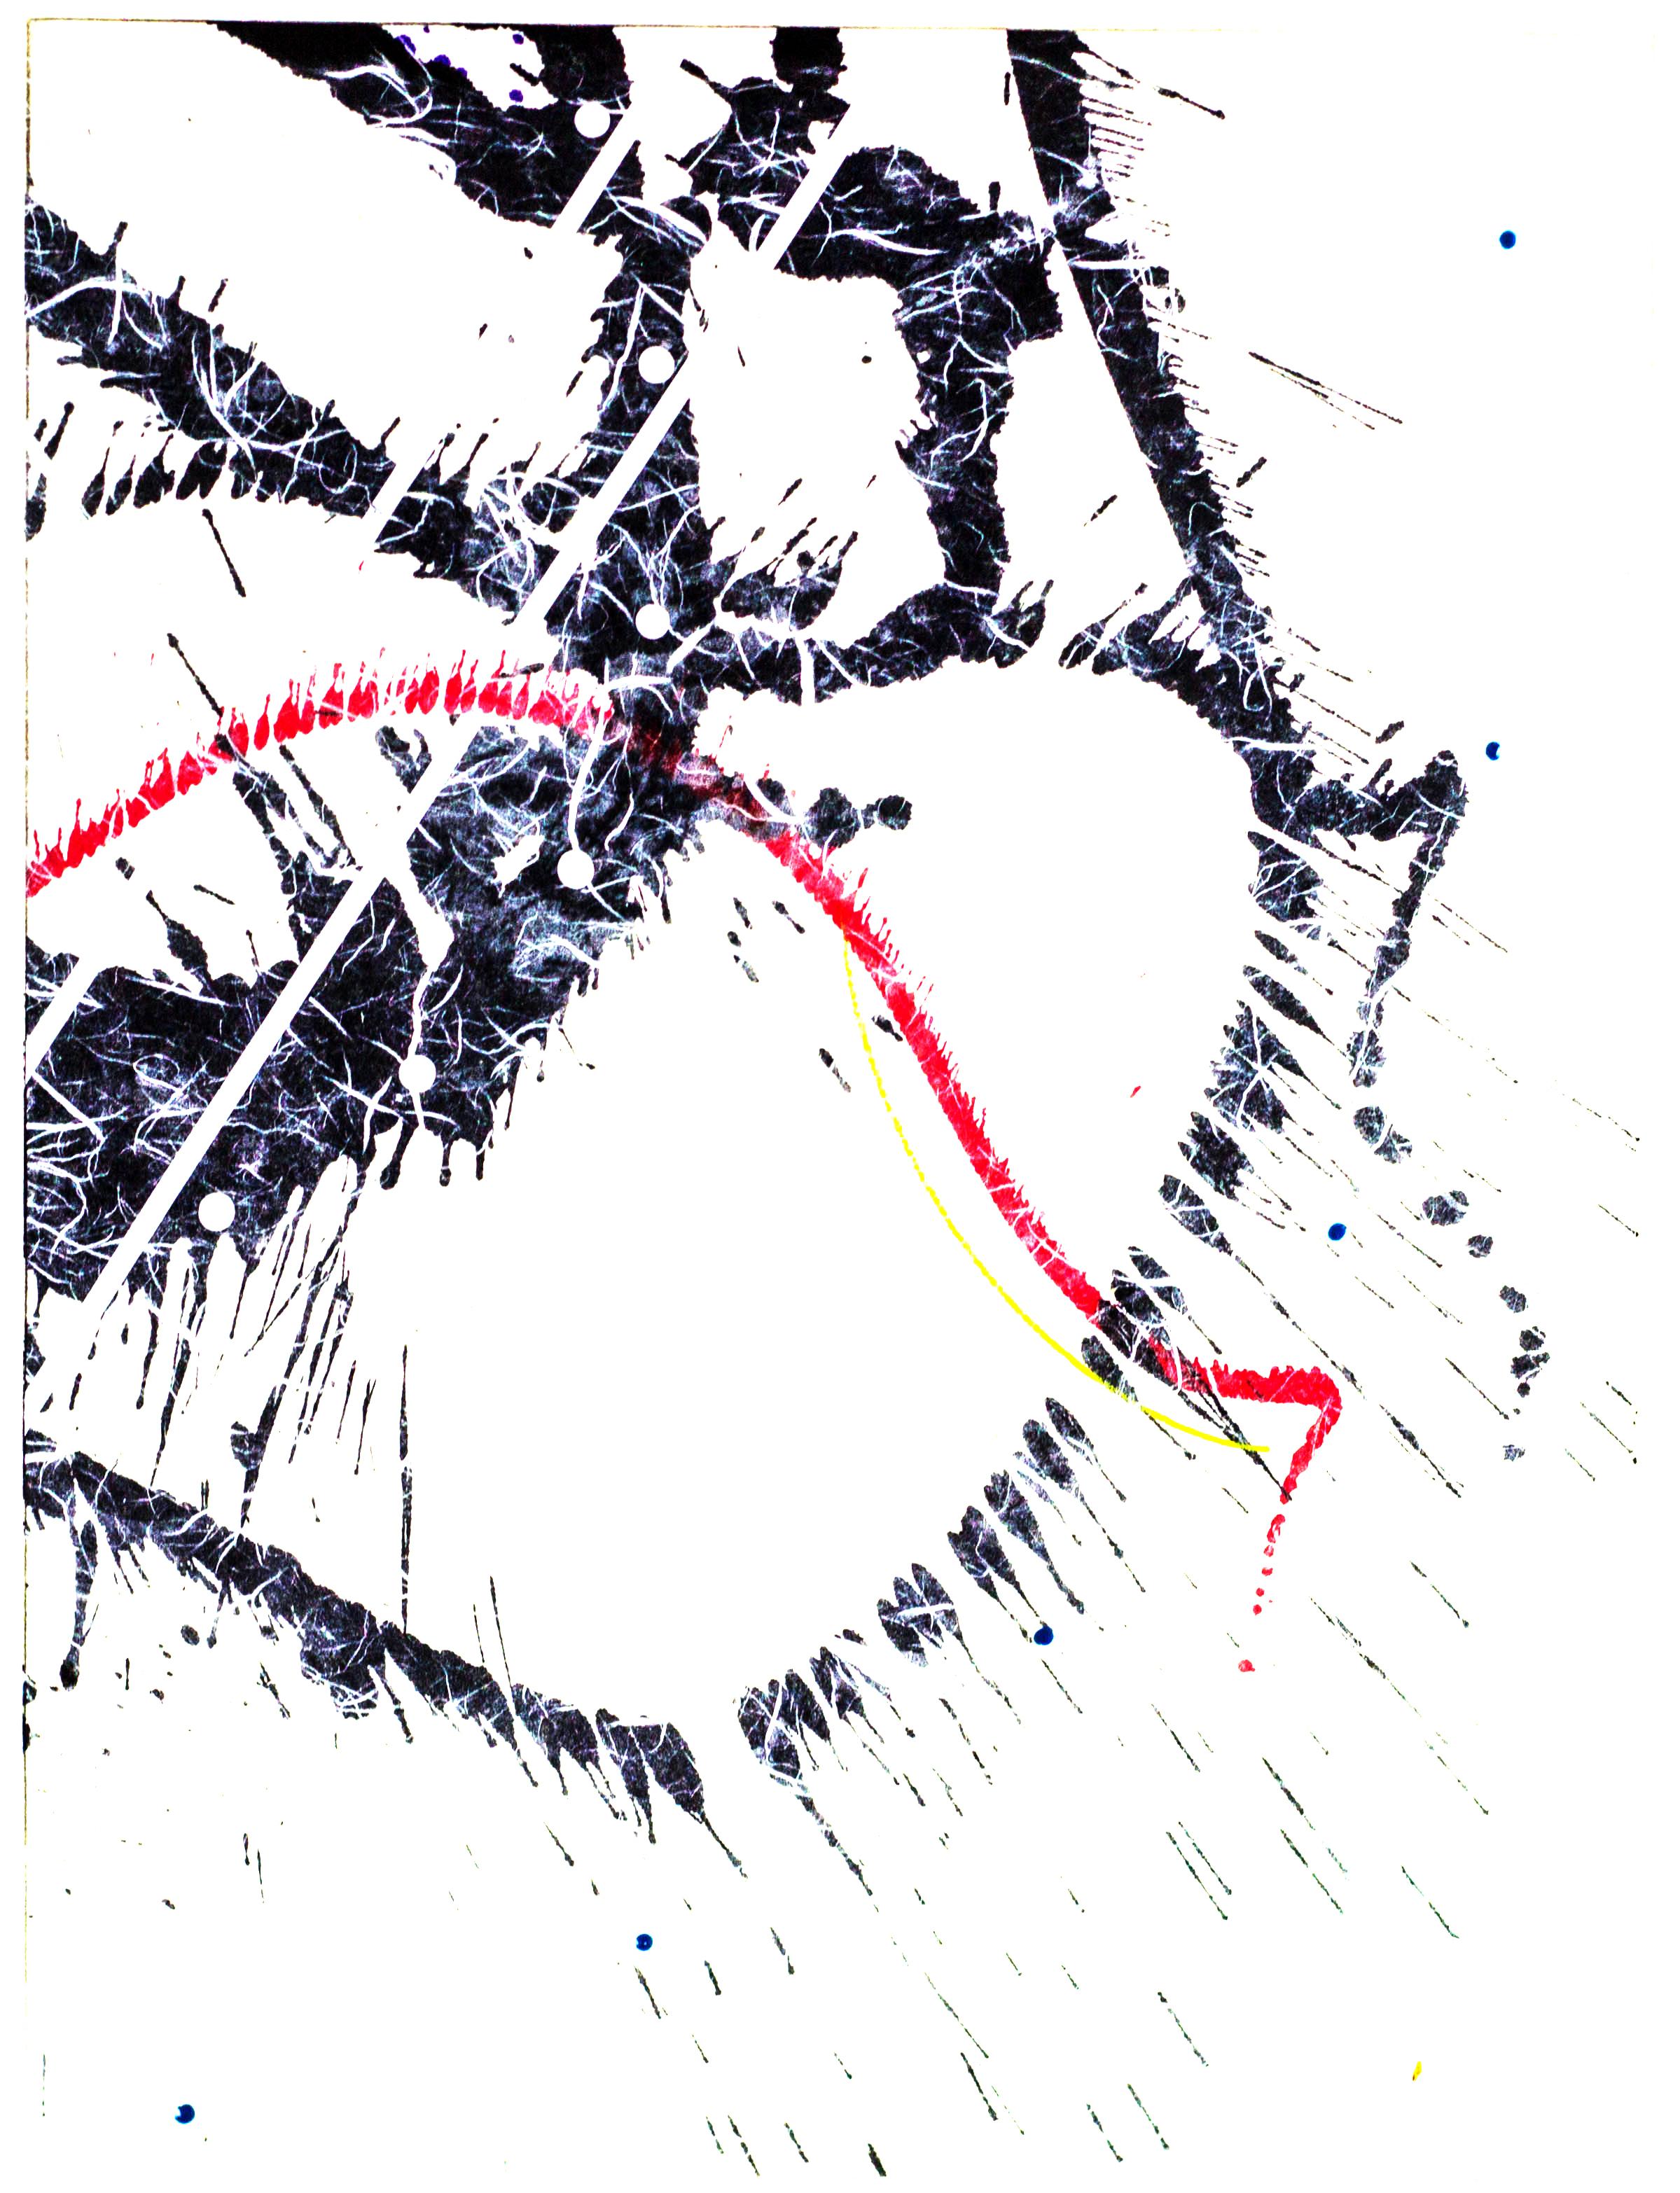 Image - CeruleanSims110116.jpg